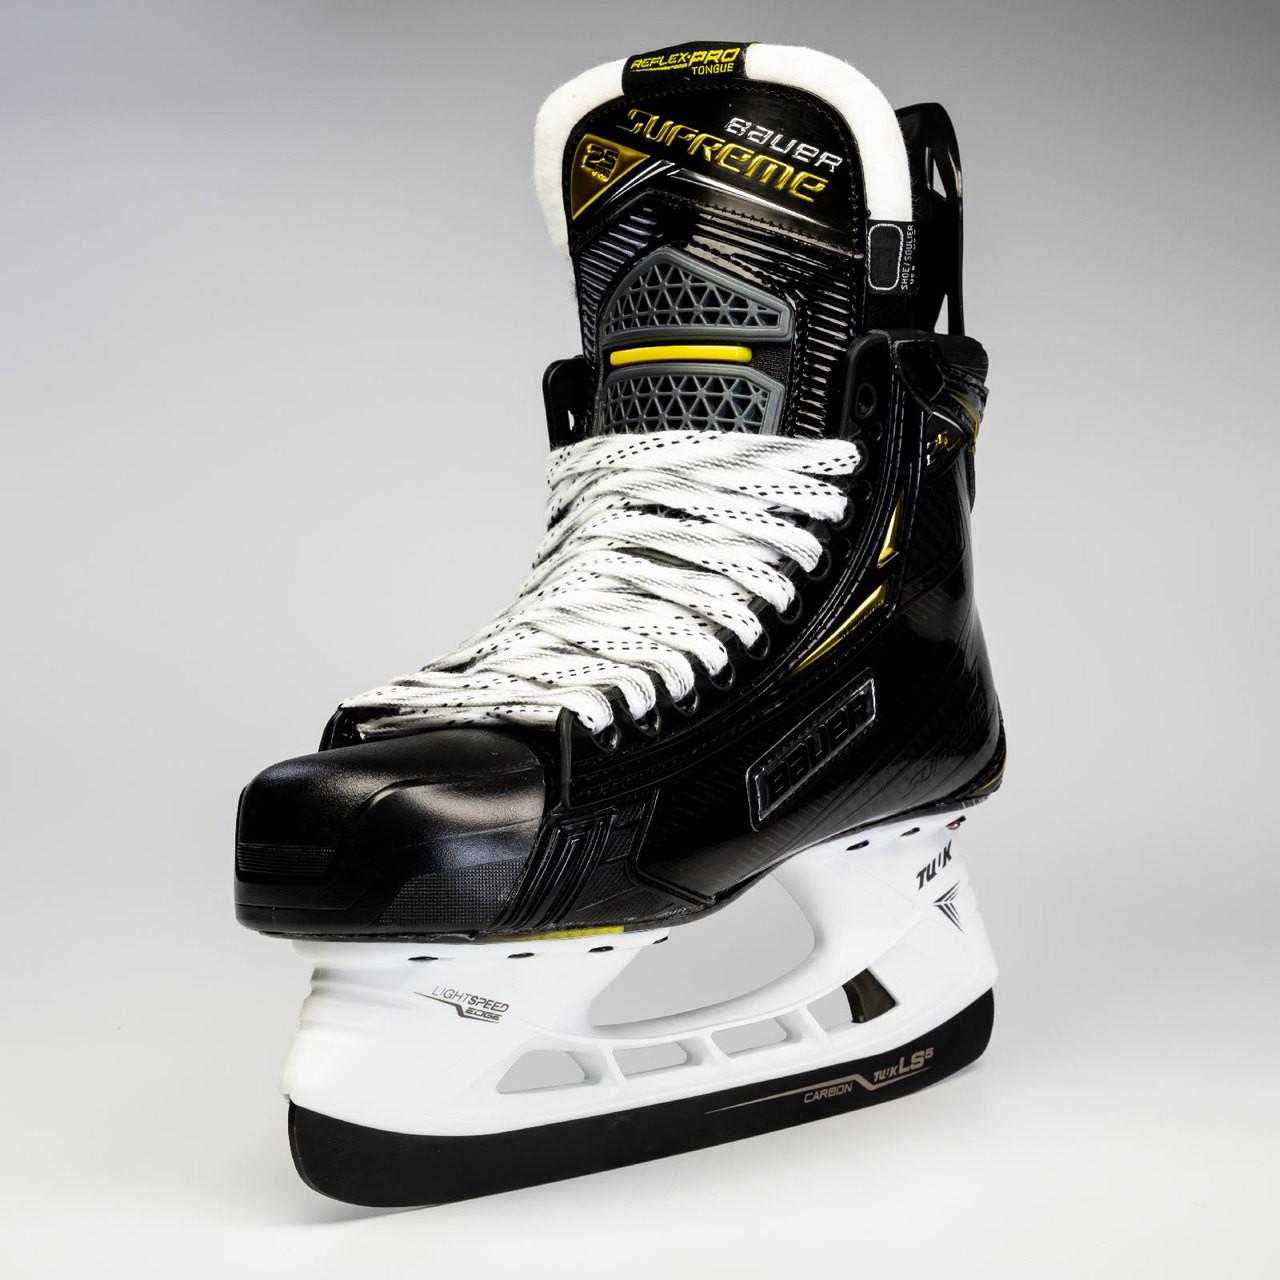 c7460bc4036 ... Bauer S18 Supreme 2S Pro Junior Hockey Skates ...